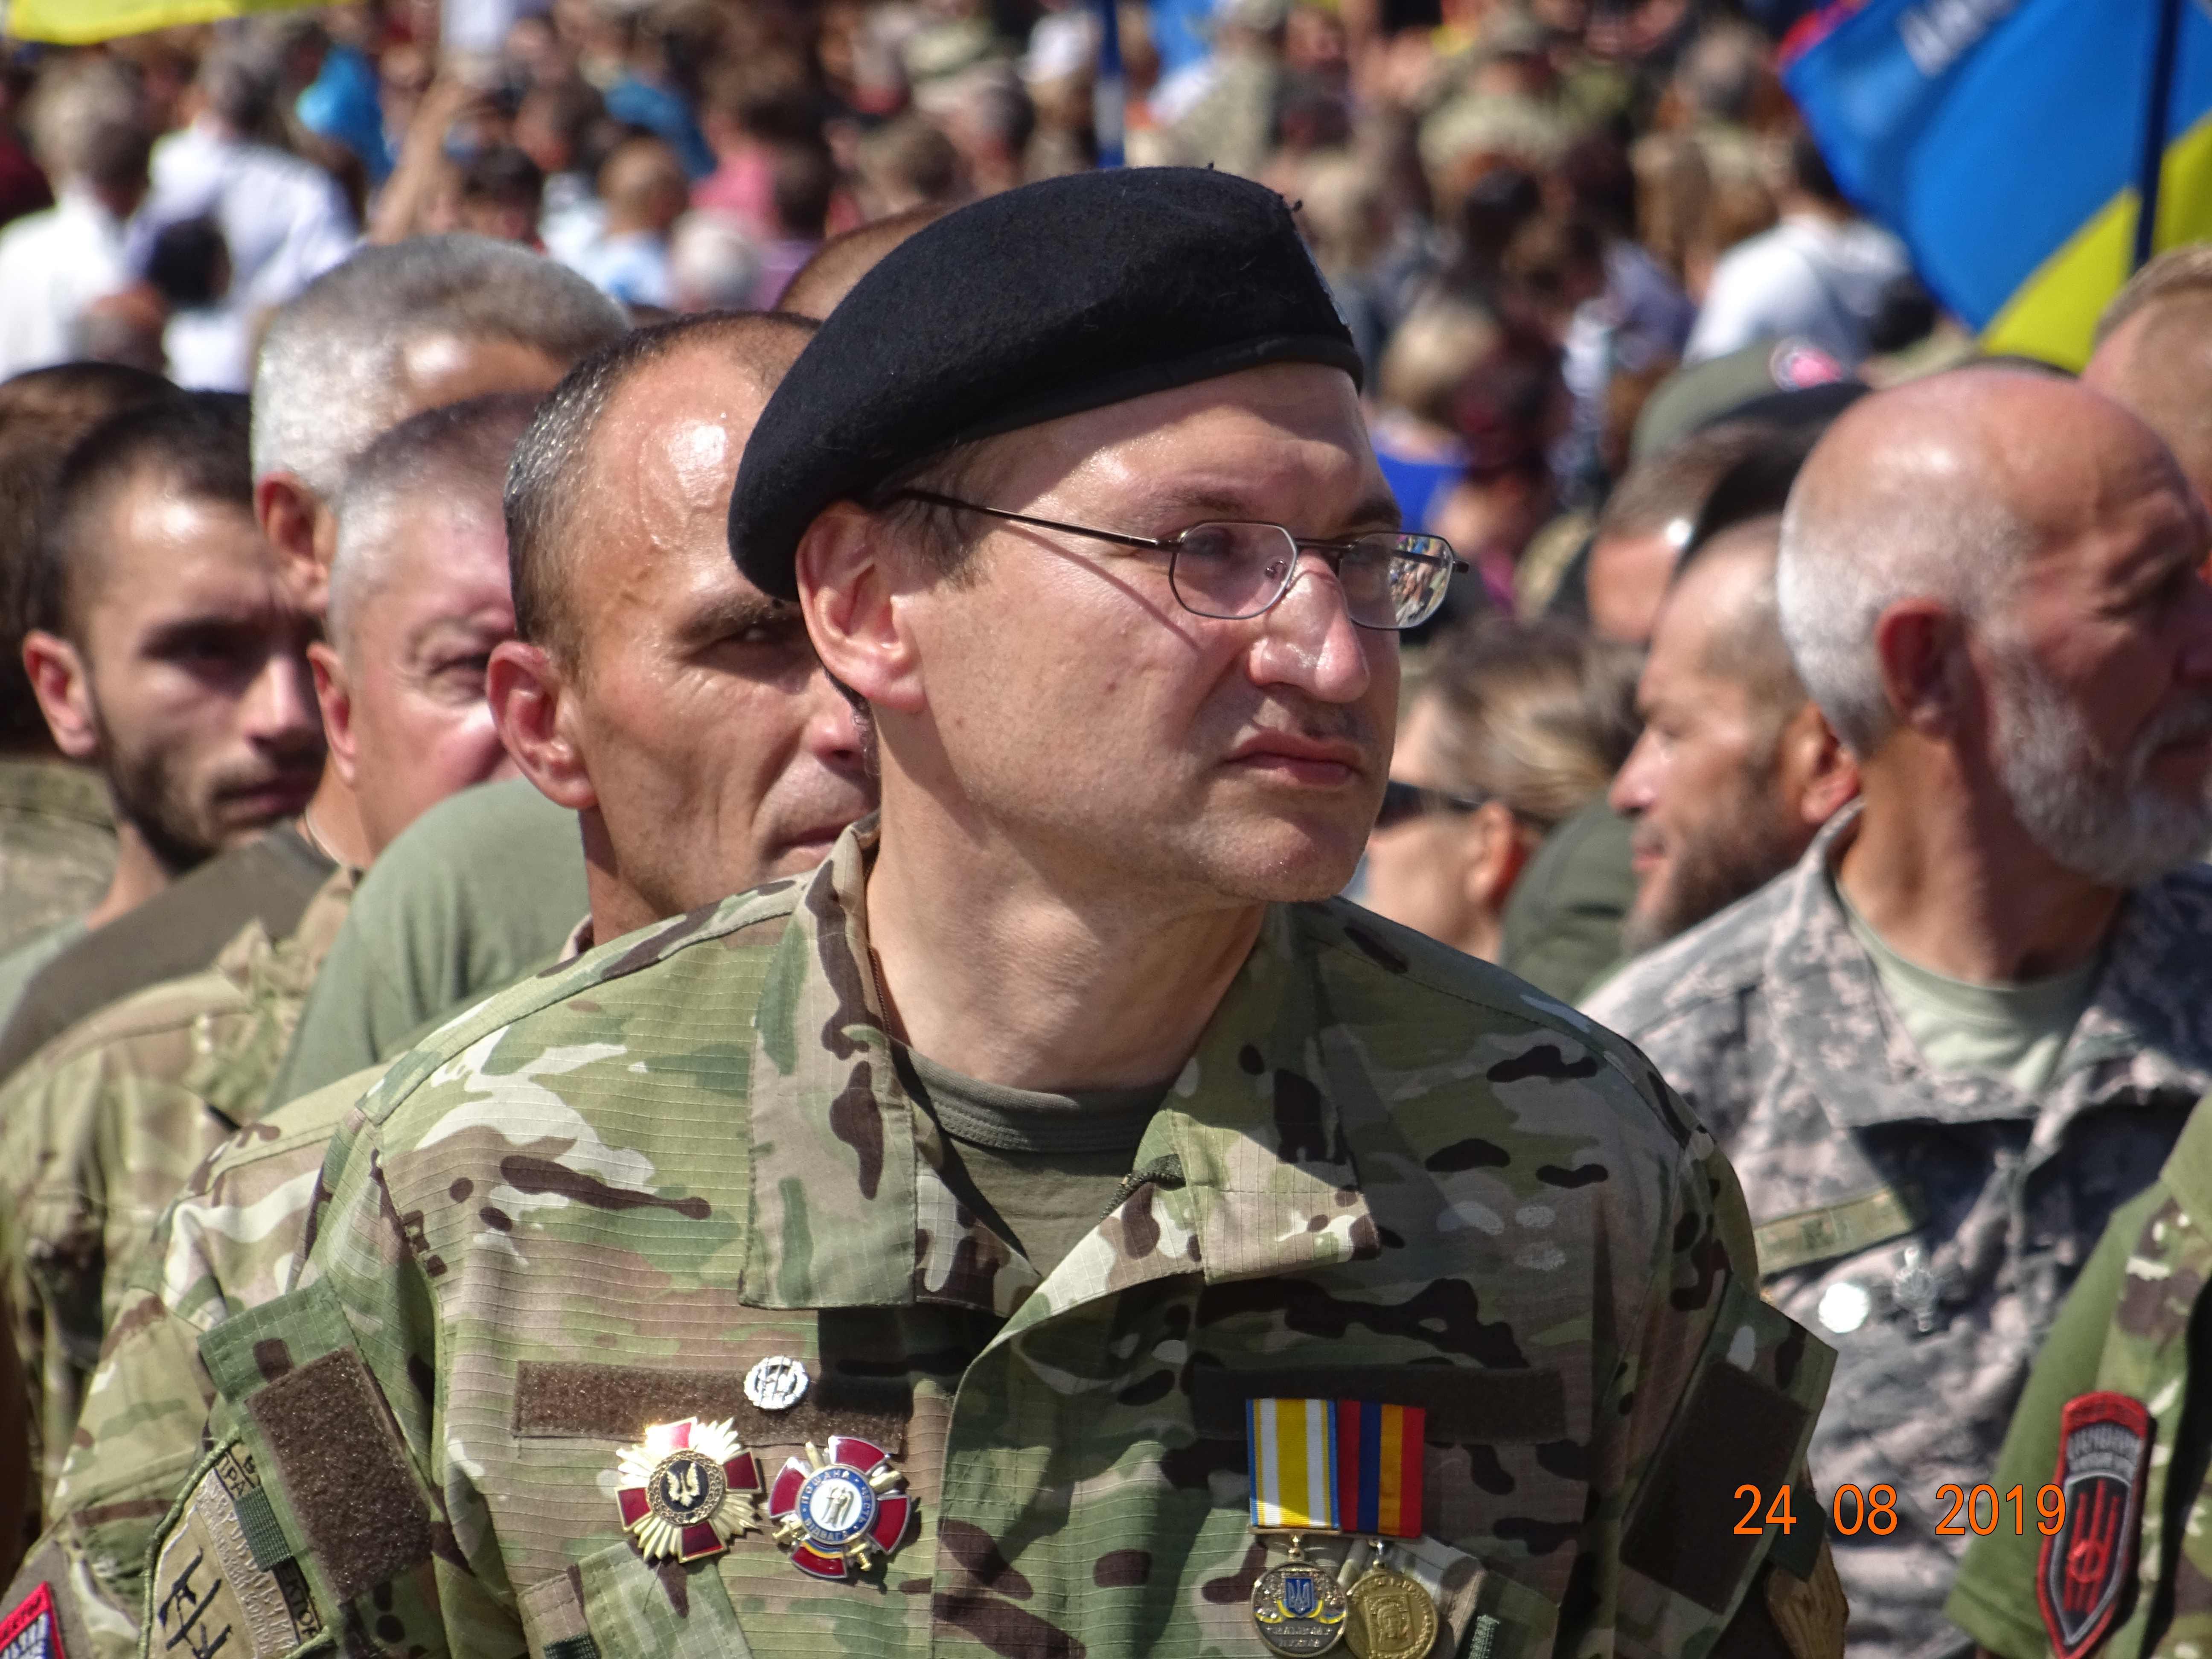 Defenders-of-Ukraine-Parad-24.Aug.19 - DSC06375.jpg